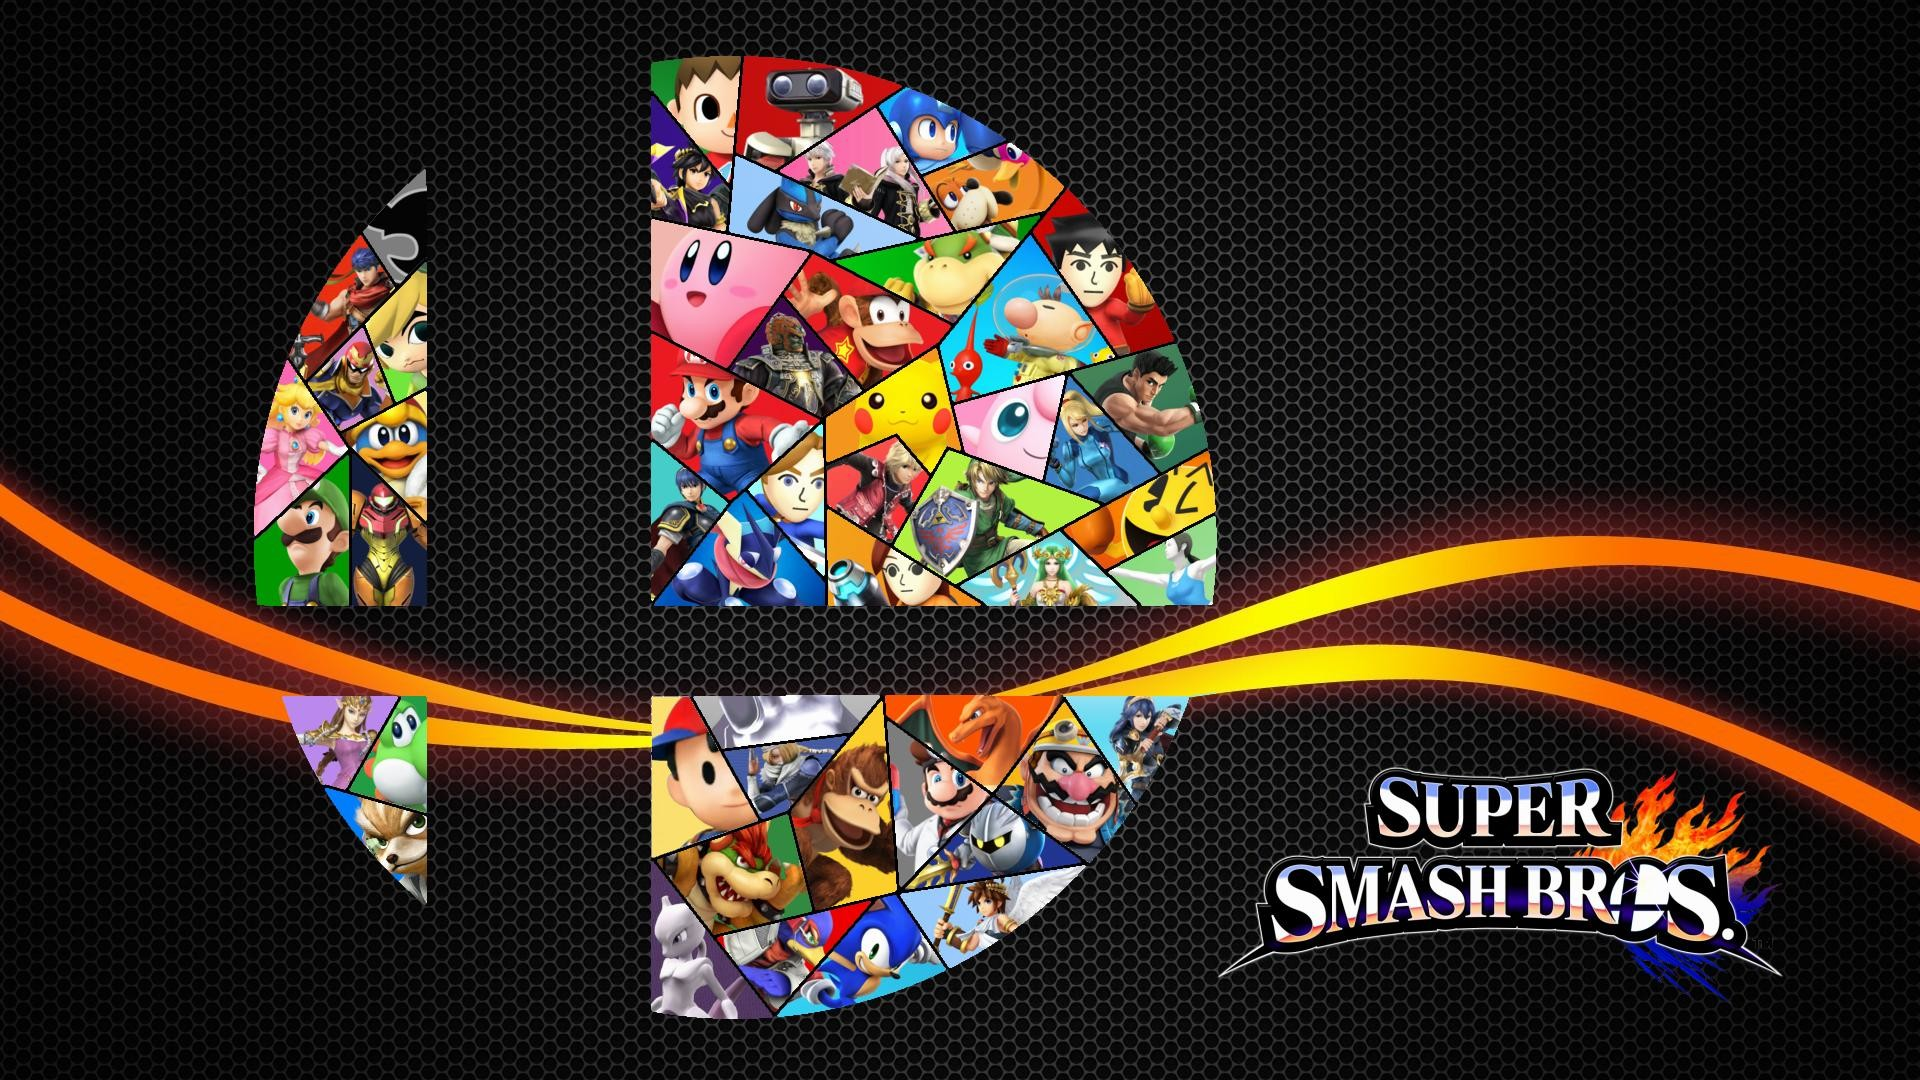 wallpaper.wiki-Game-Super-Smash-Bros-HD-Wallpaper-PIC-WPE006110